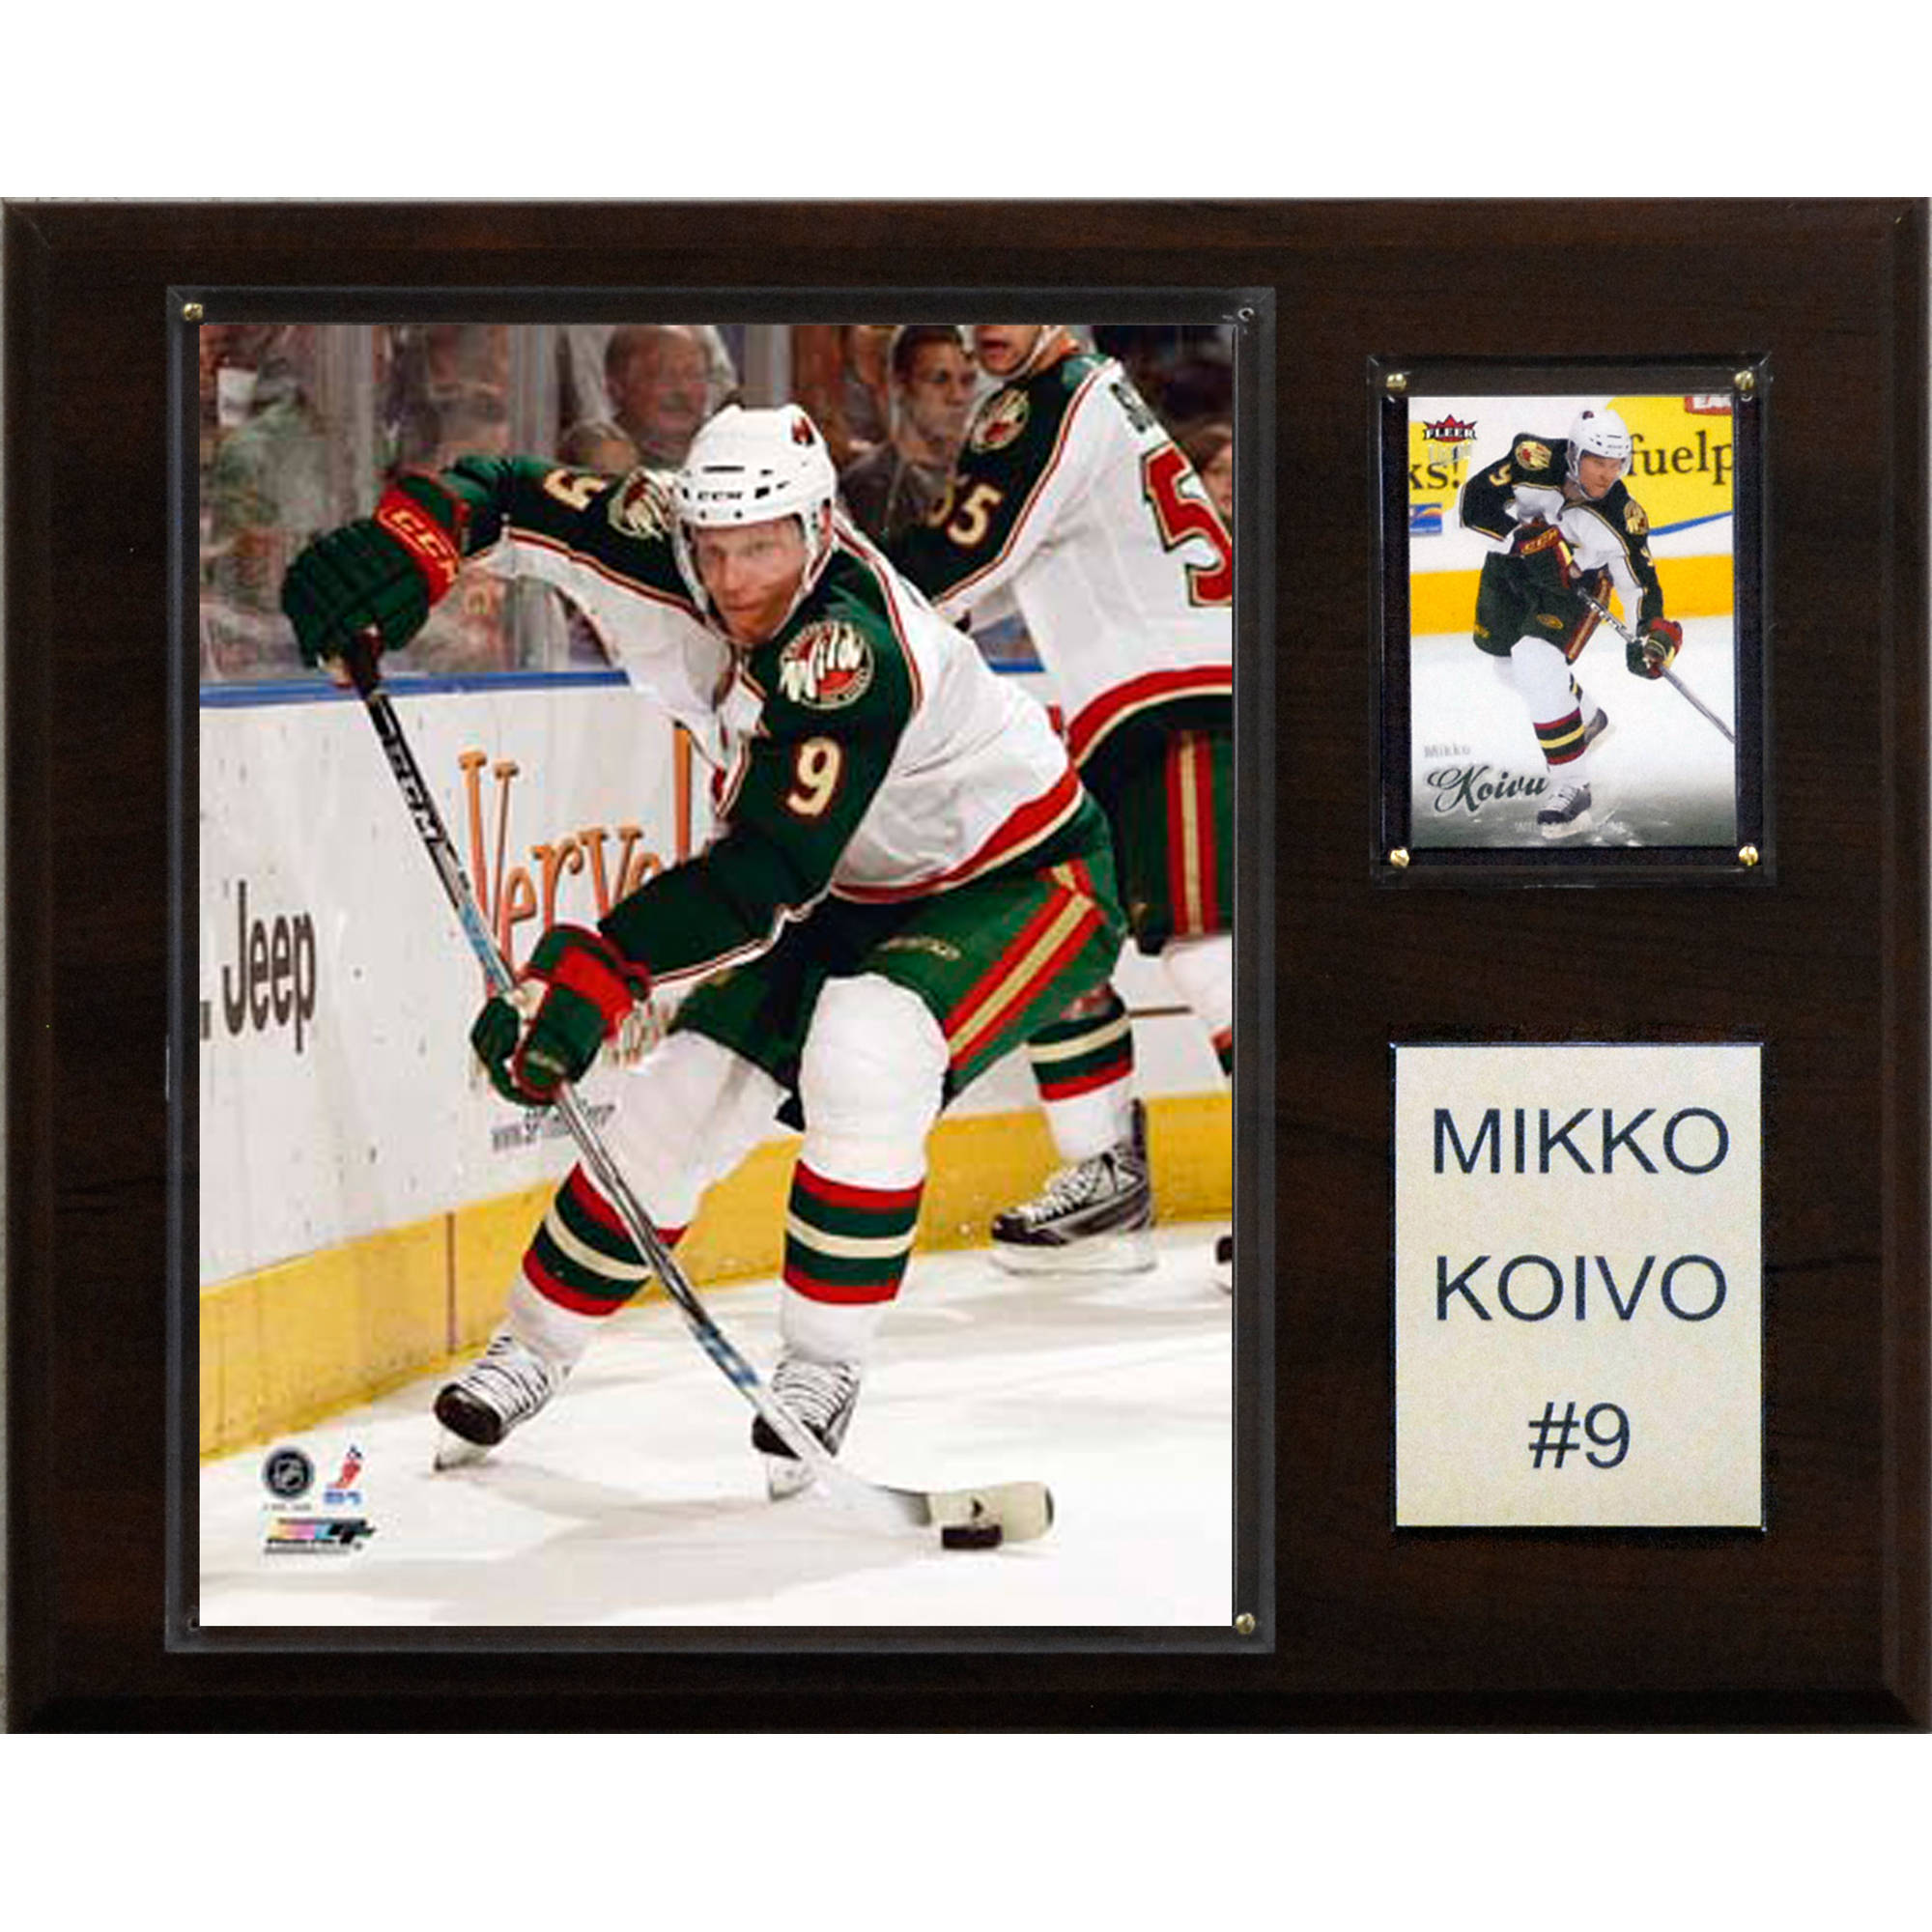 C&I Collectables NHL 12x15 Mikko Koivu Minnesota Wild Player Plaque